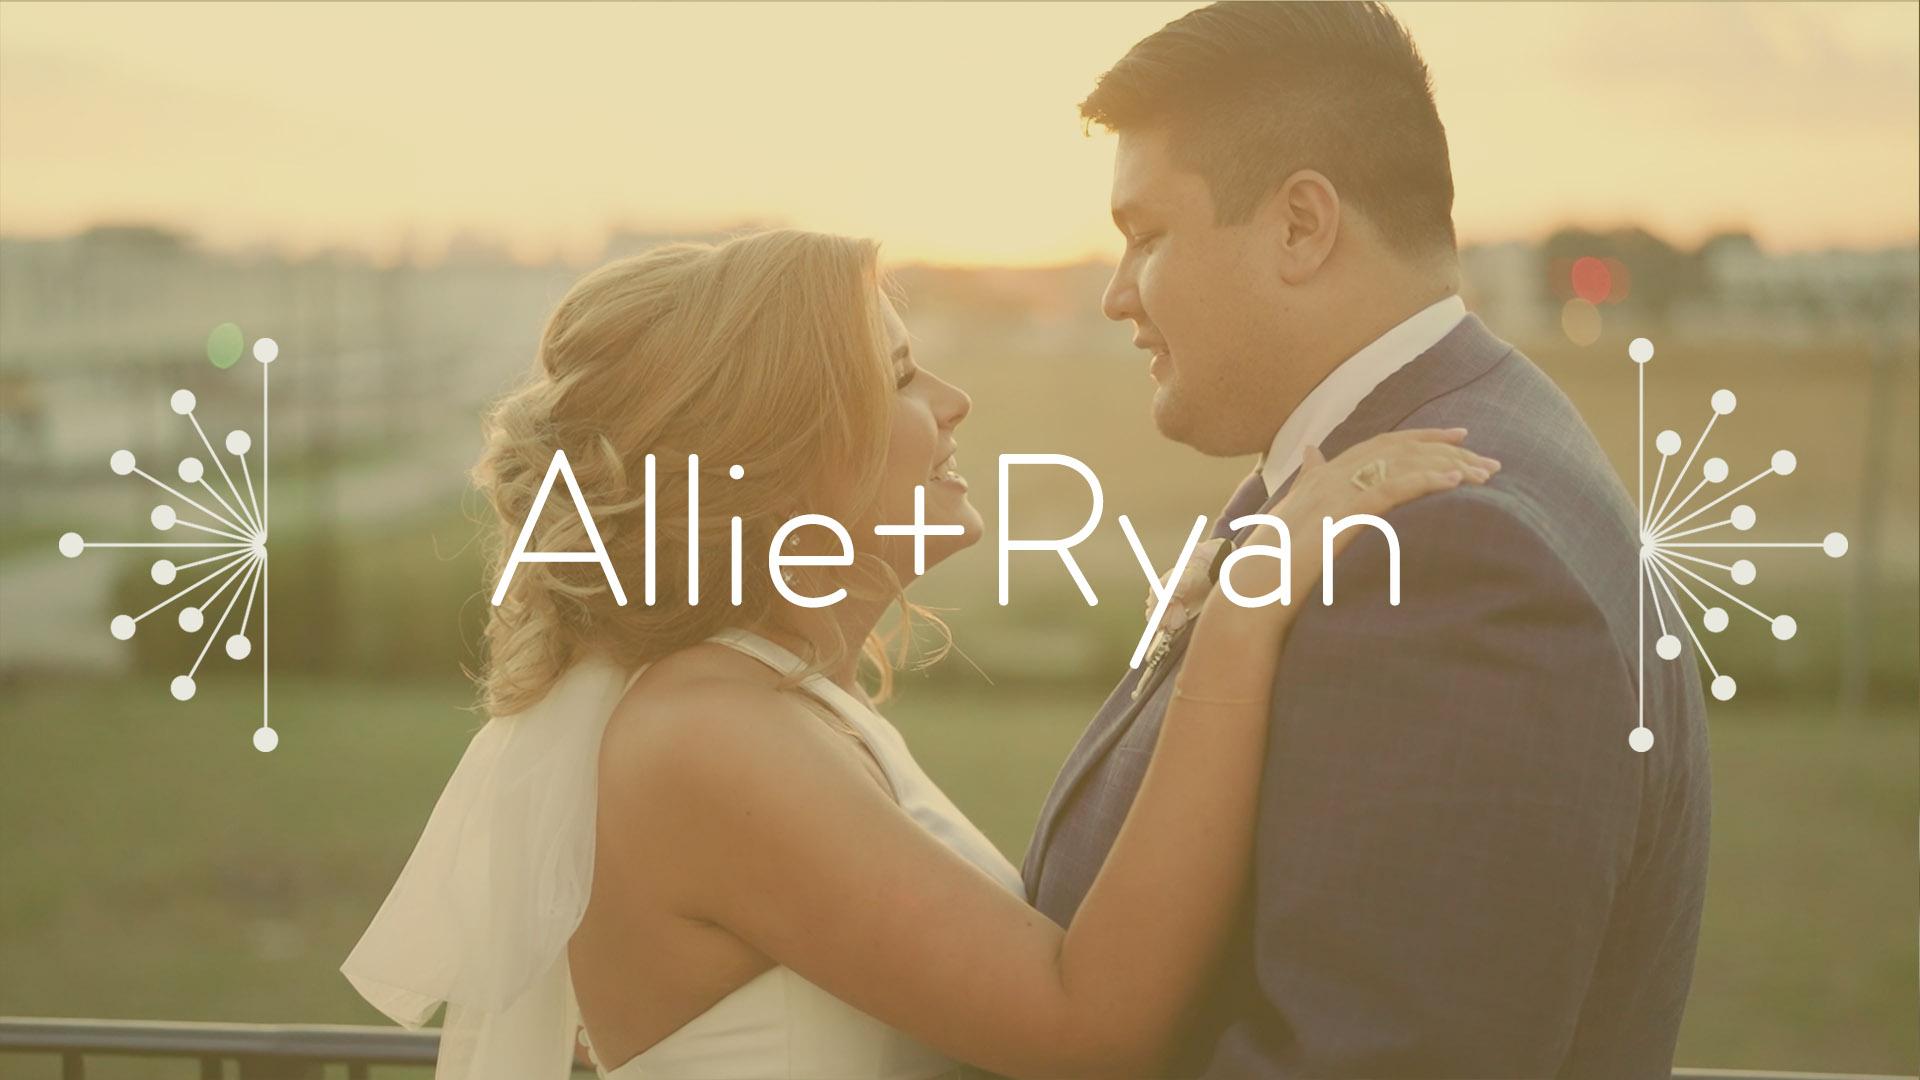 Allie + Ryan | Houston, Texas | The Astorian